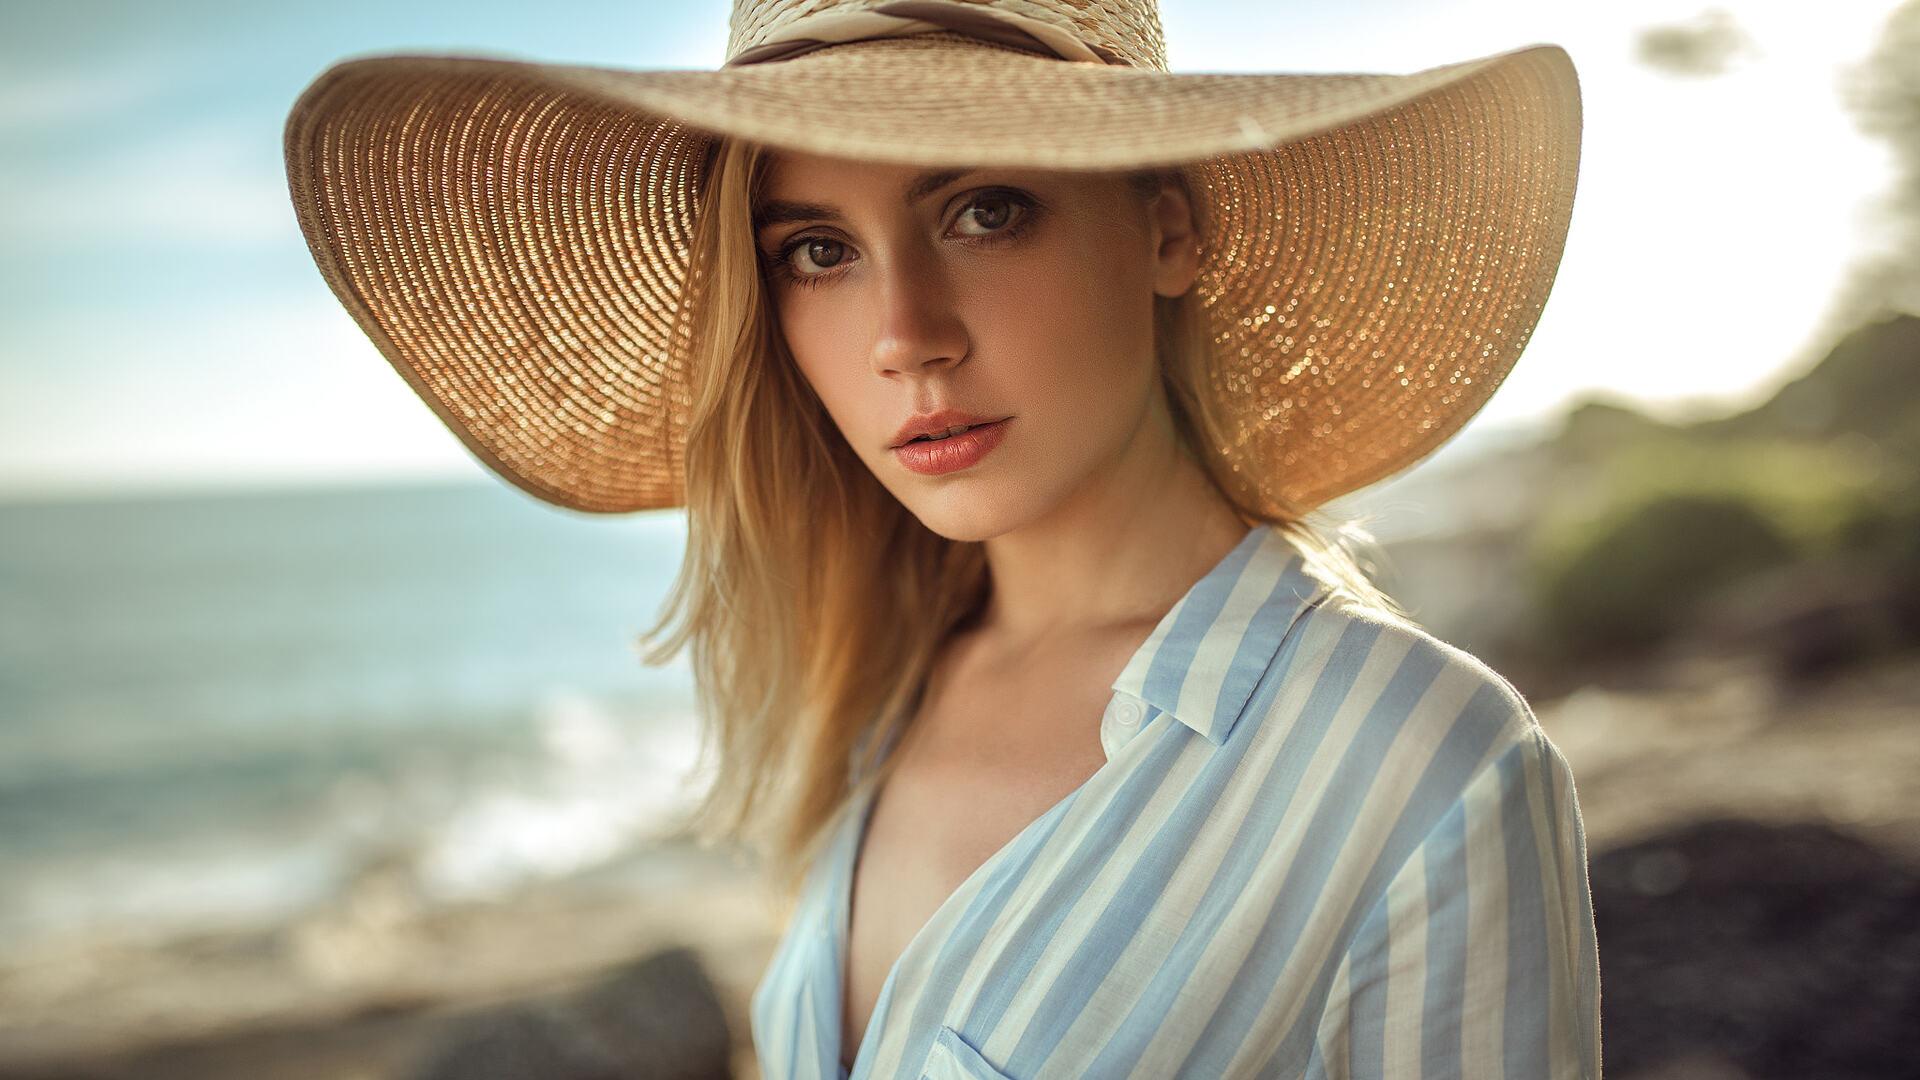 1920x1080 Cute Beautiful Girl With Hat Laptop Full Hd 1080p Hd 4k